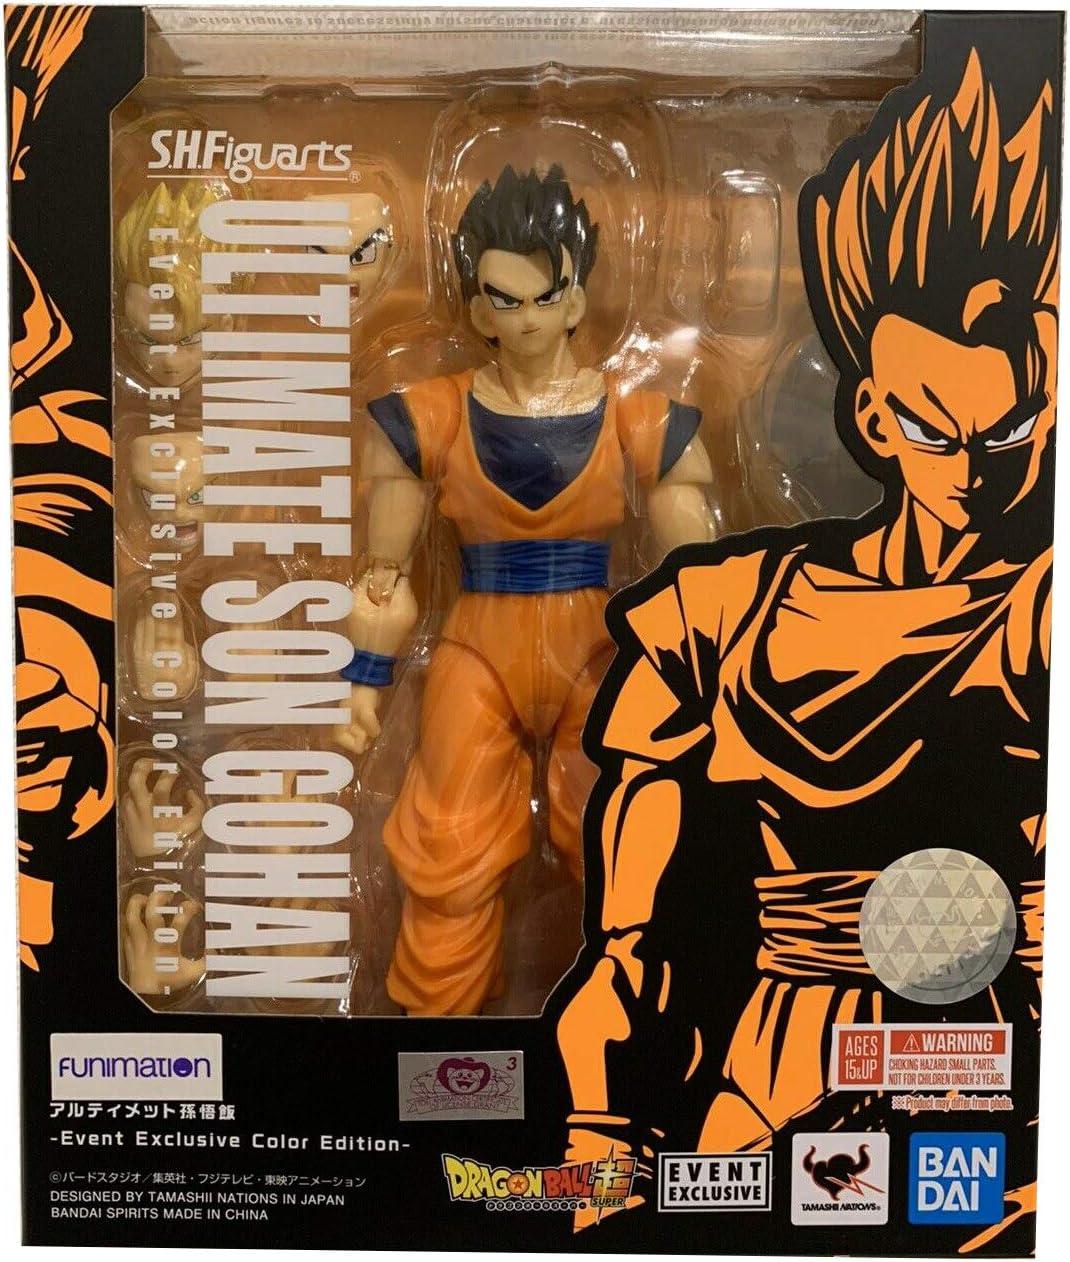 Figuarts Dragon ball Z Great Saiyaman Son Gohan Action Figure New In Box S.H